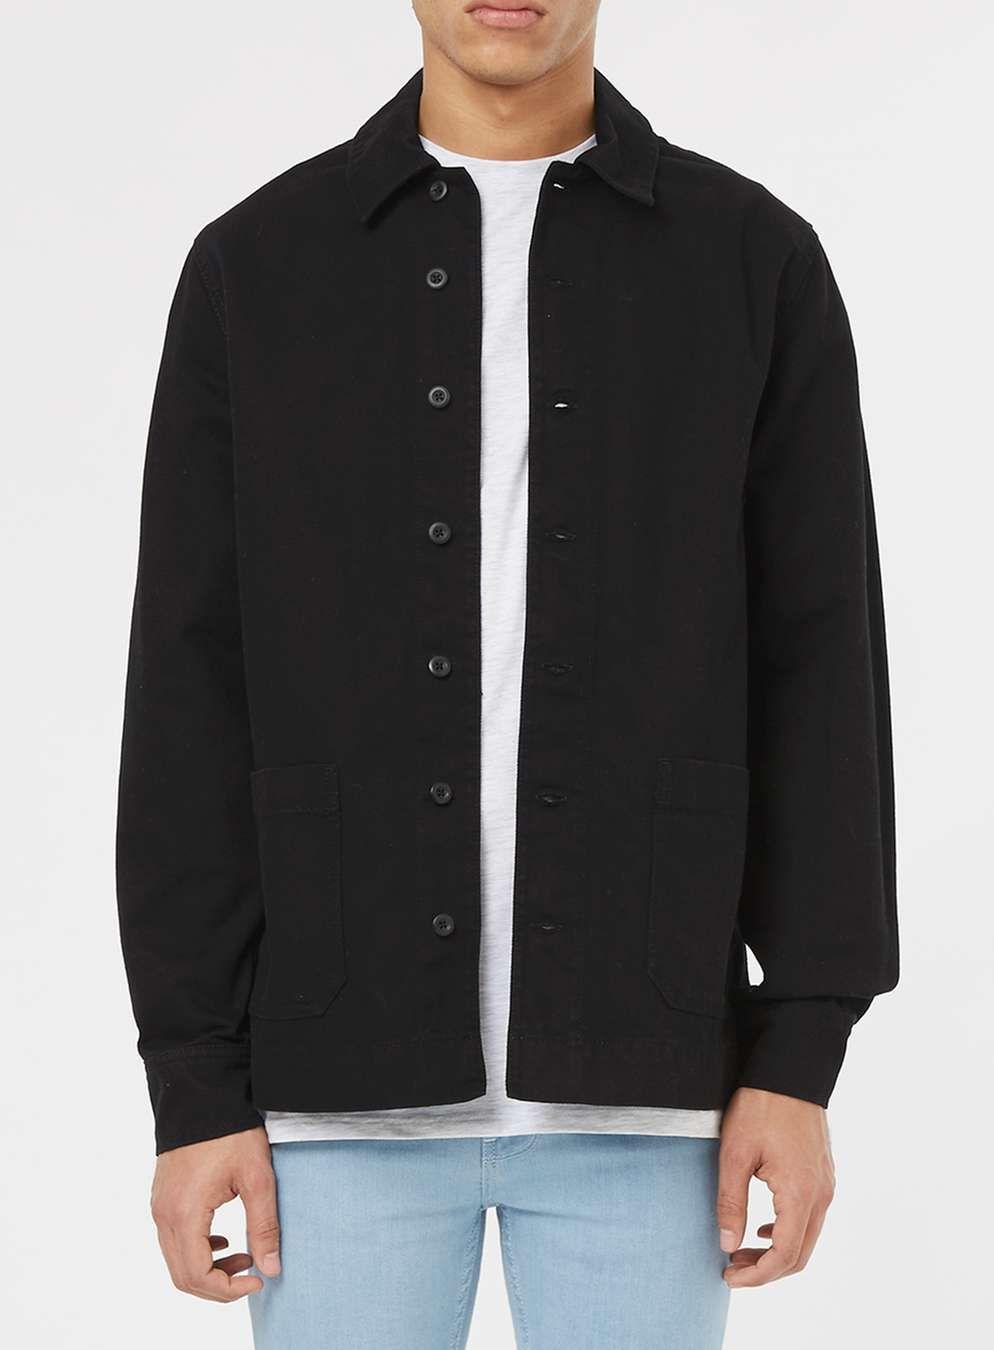 8252ce77 Black Denim Long Sleeve Overshirt | Cool Items | Black denim, Work ...